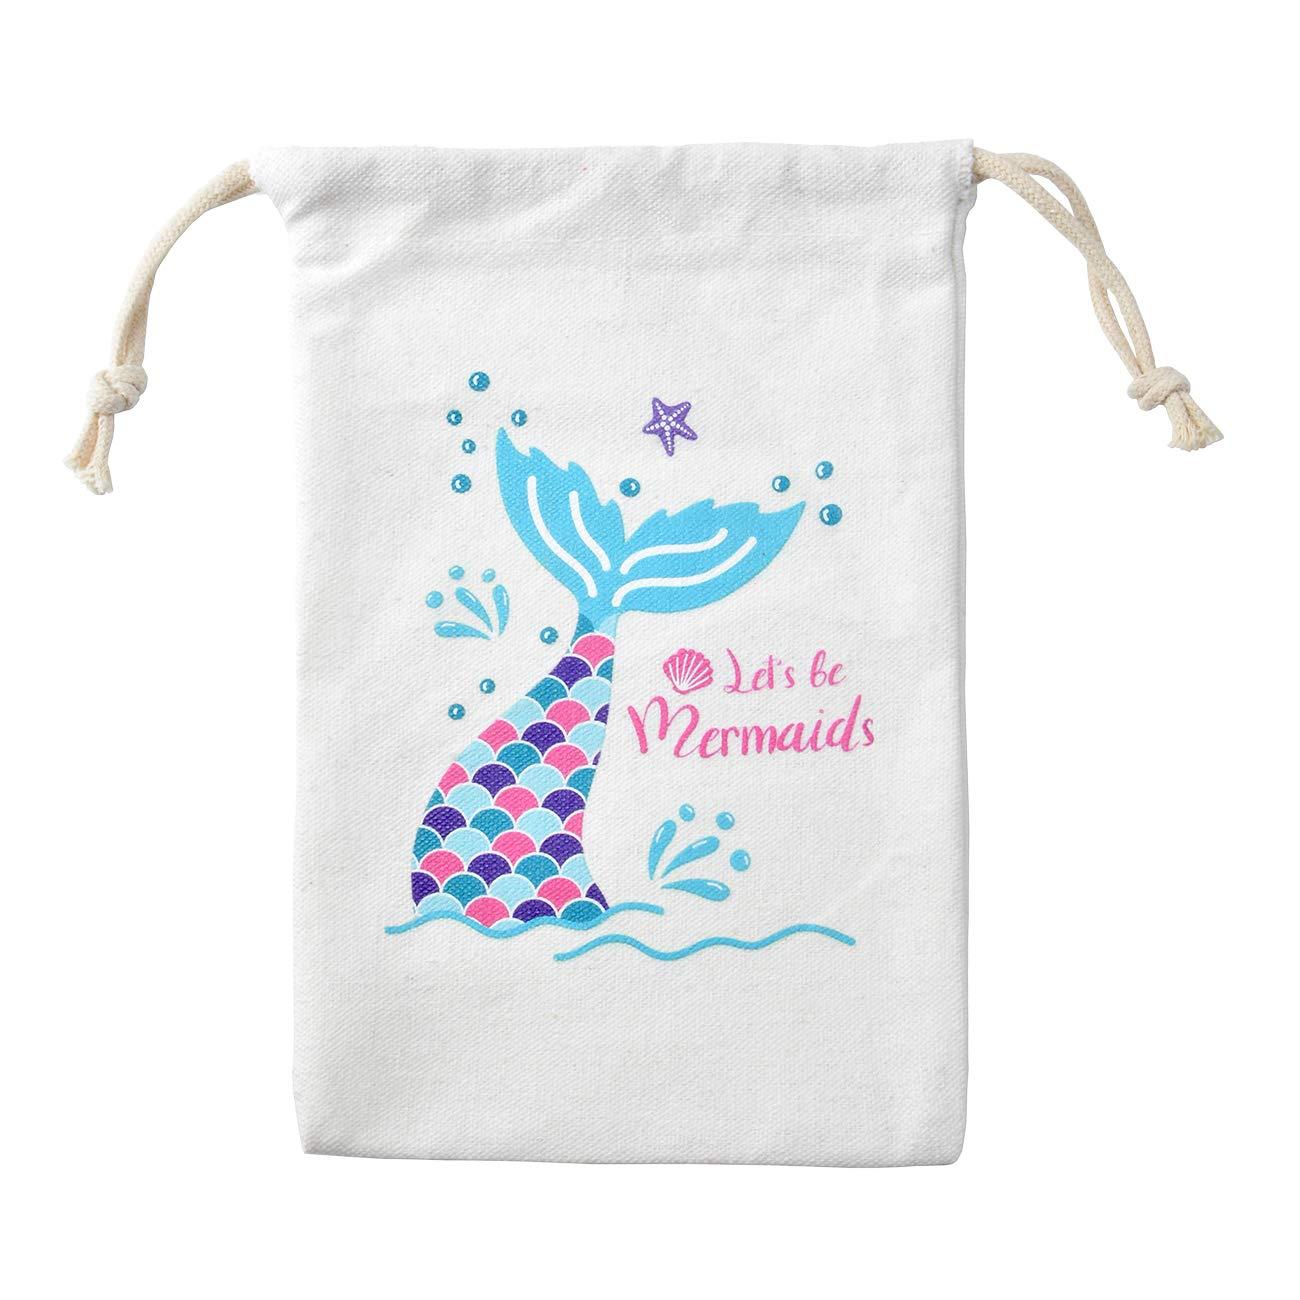 KREATWOW Mermaid Party Favor Bags Drawstring Goody Bags for Kid Mermaid Party Supplies 10 Pack